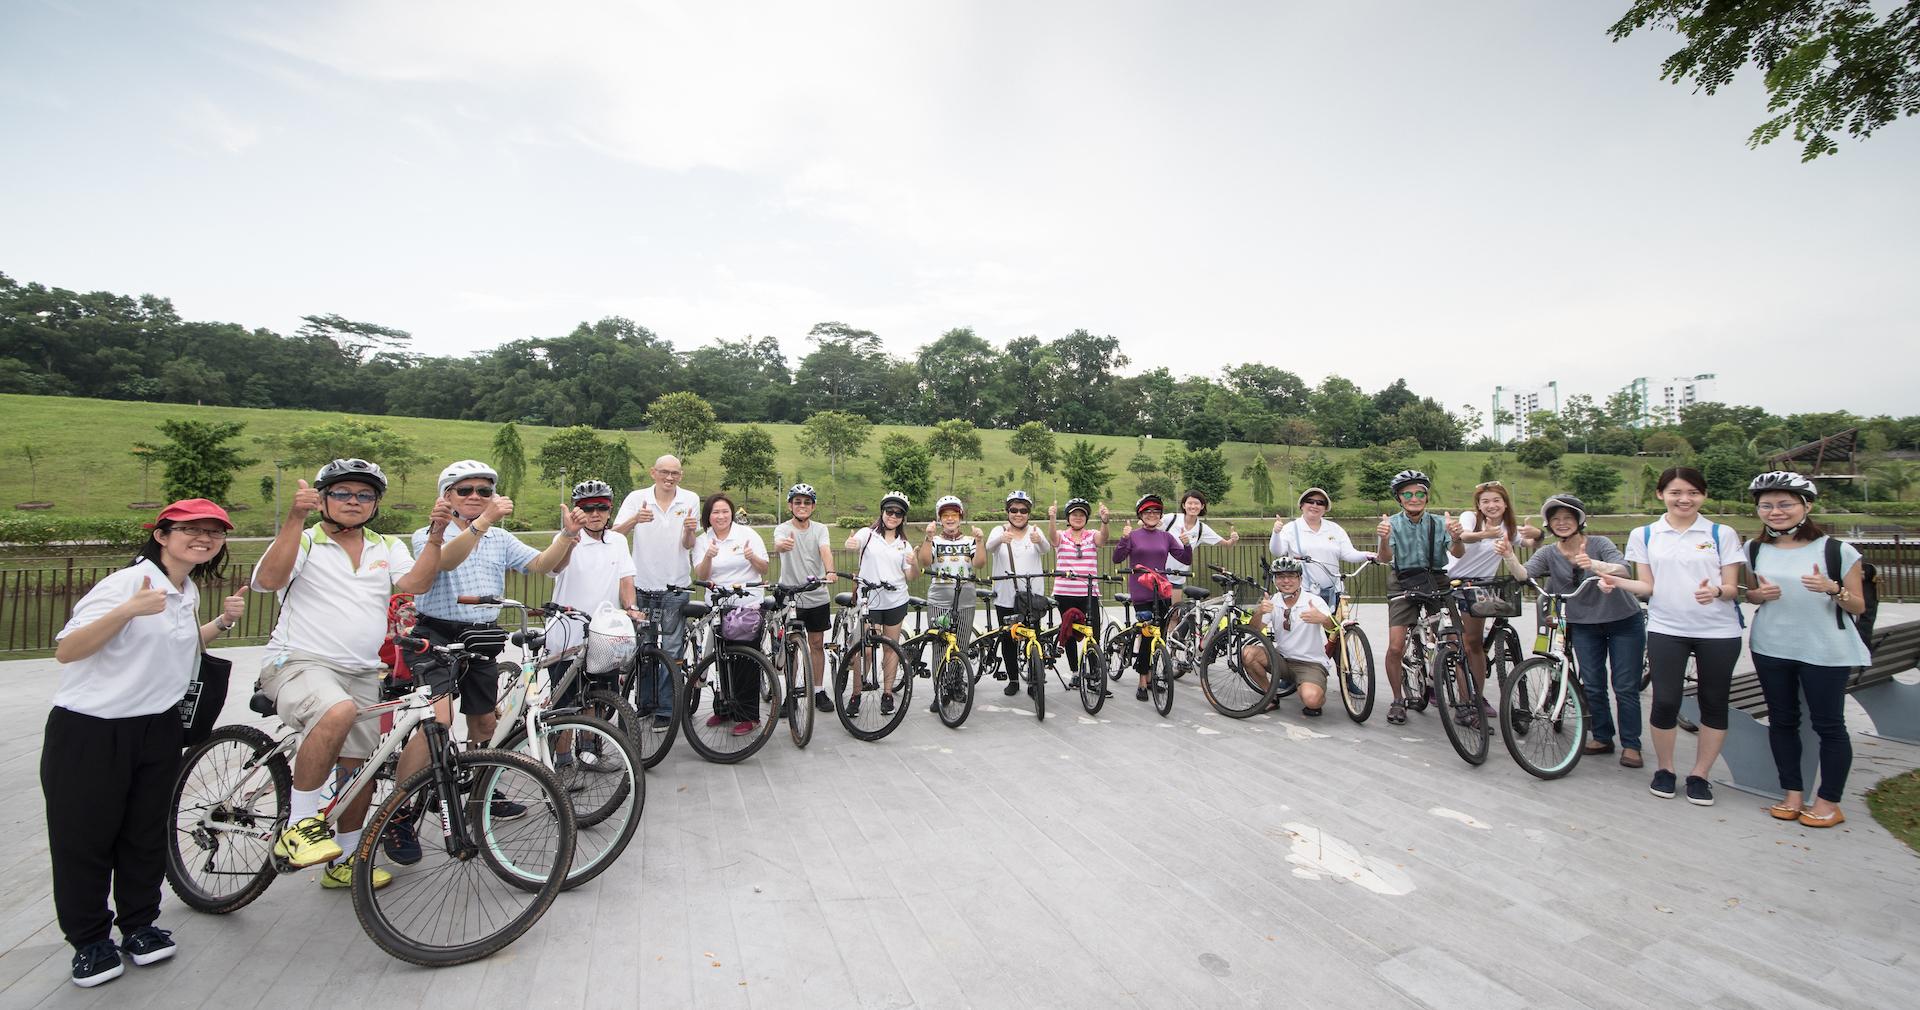 Community Biking